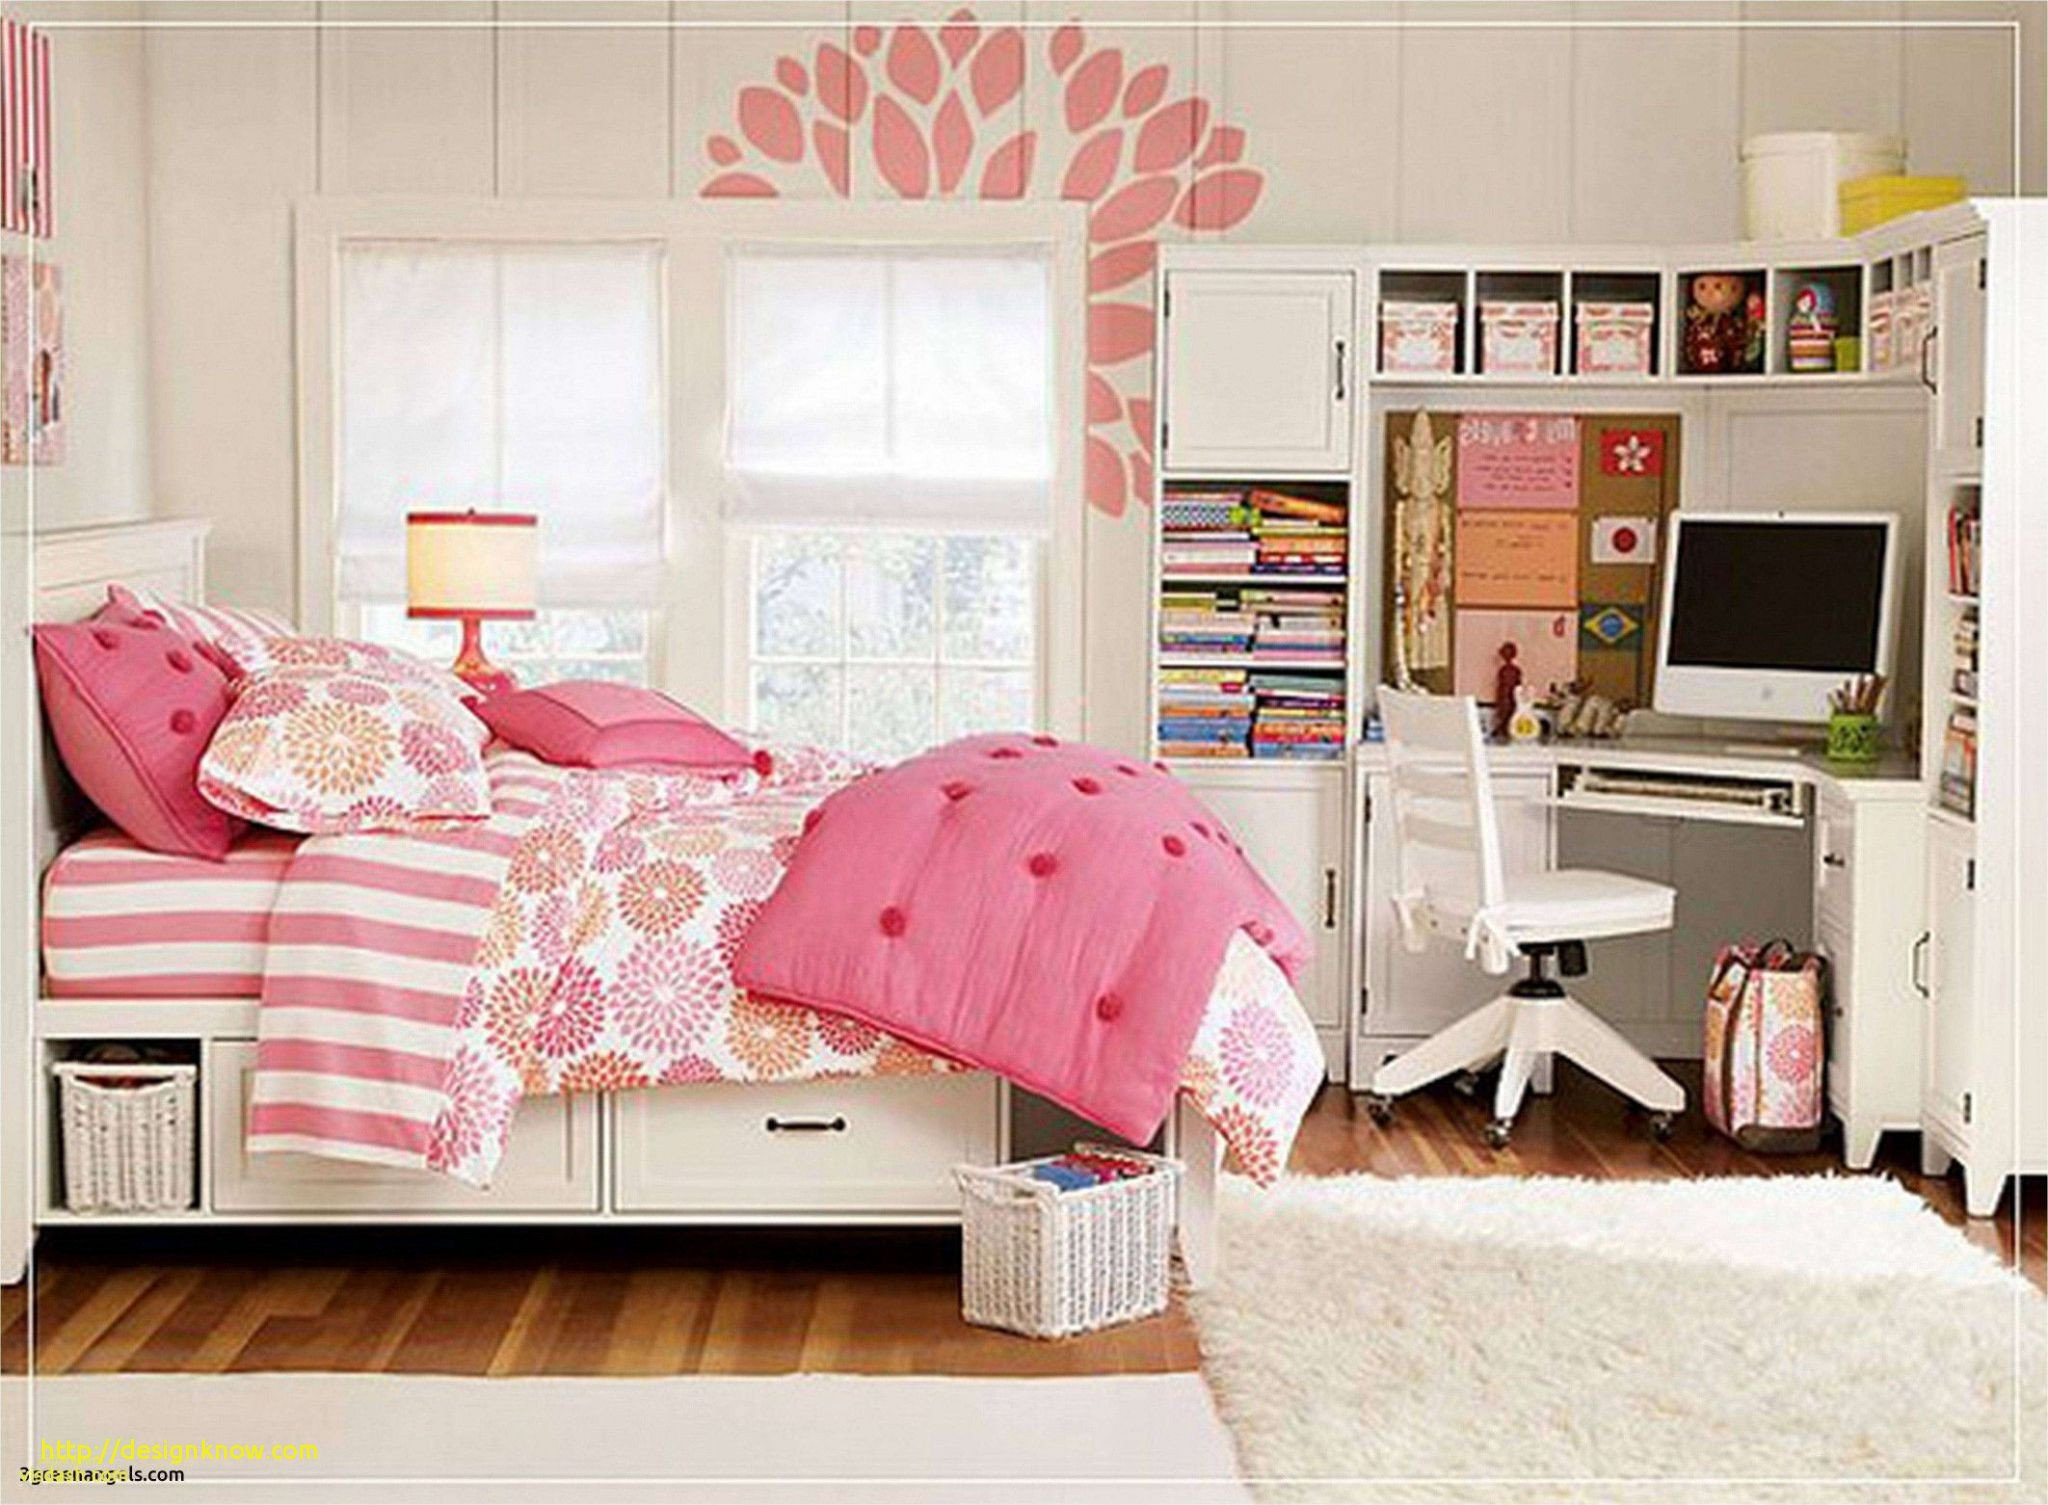 Kid Bedroom Decorating Idea Luxury Unique Interior Design for Small Size Bedroom